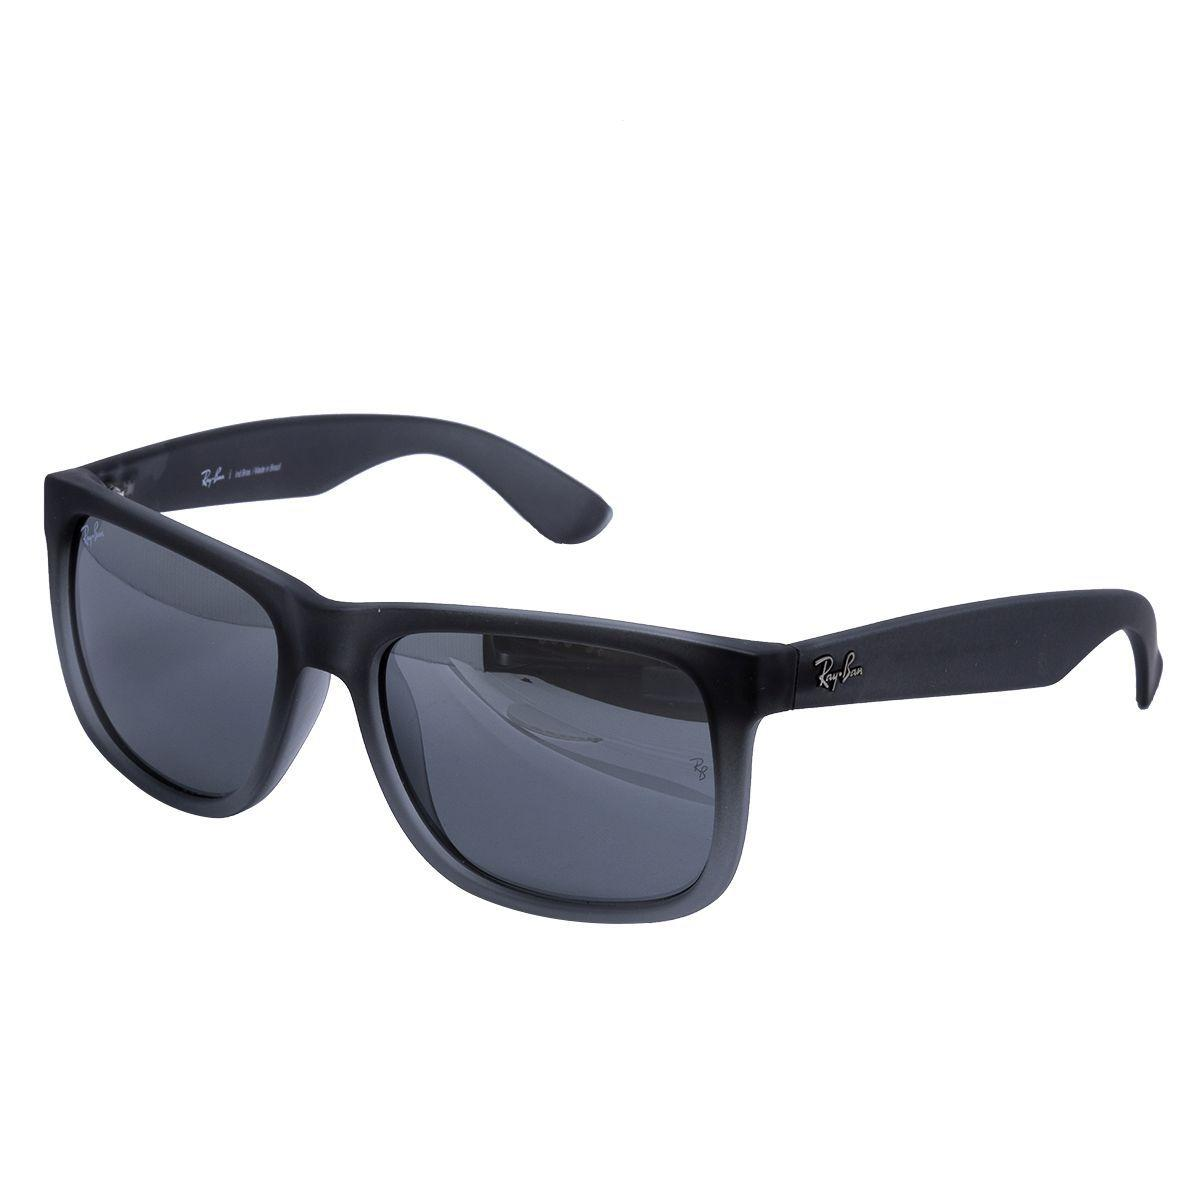 c98cd16757f99 Óculos de Sol Ray Ban Justin RB4165L 852 88 - Acetato Preto Fosco, Lente  Cinza R  531,00 à vista. Adicionar à sacola